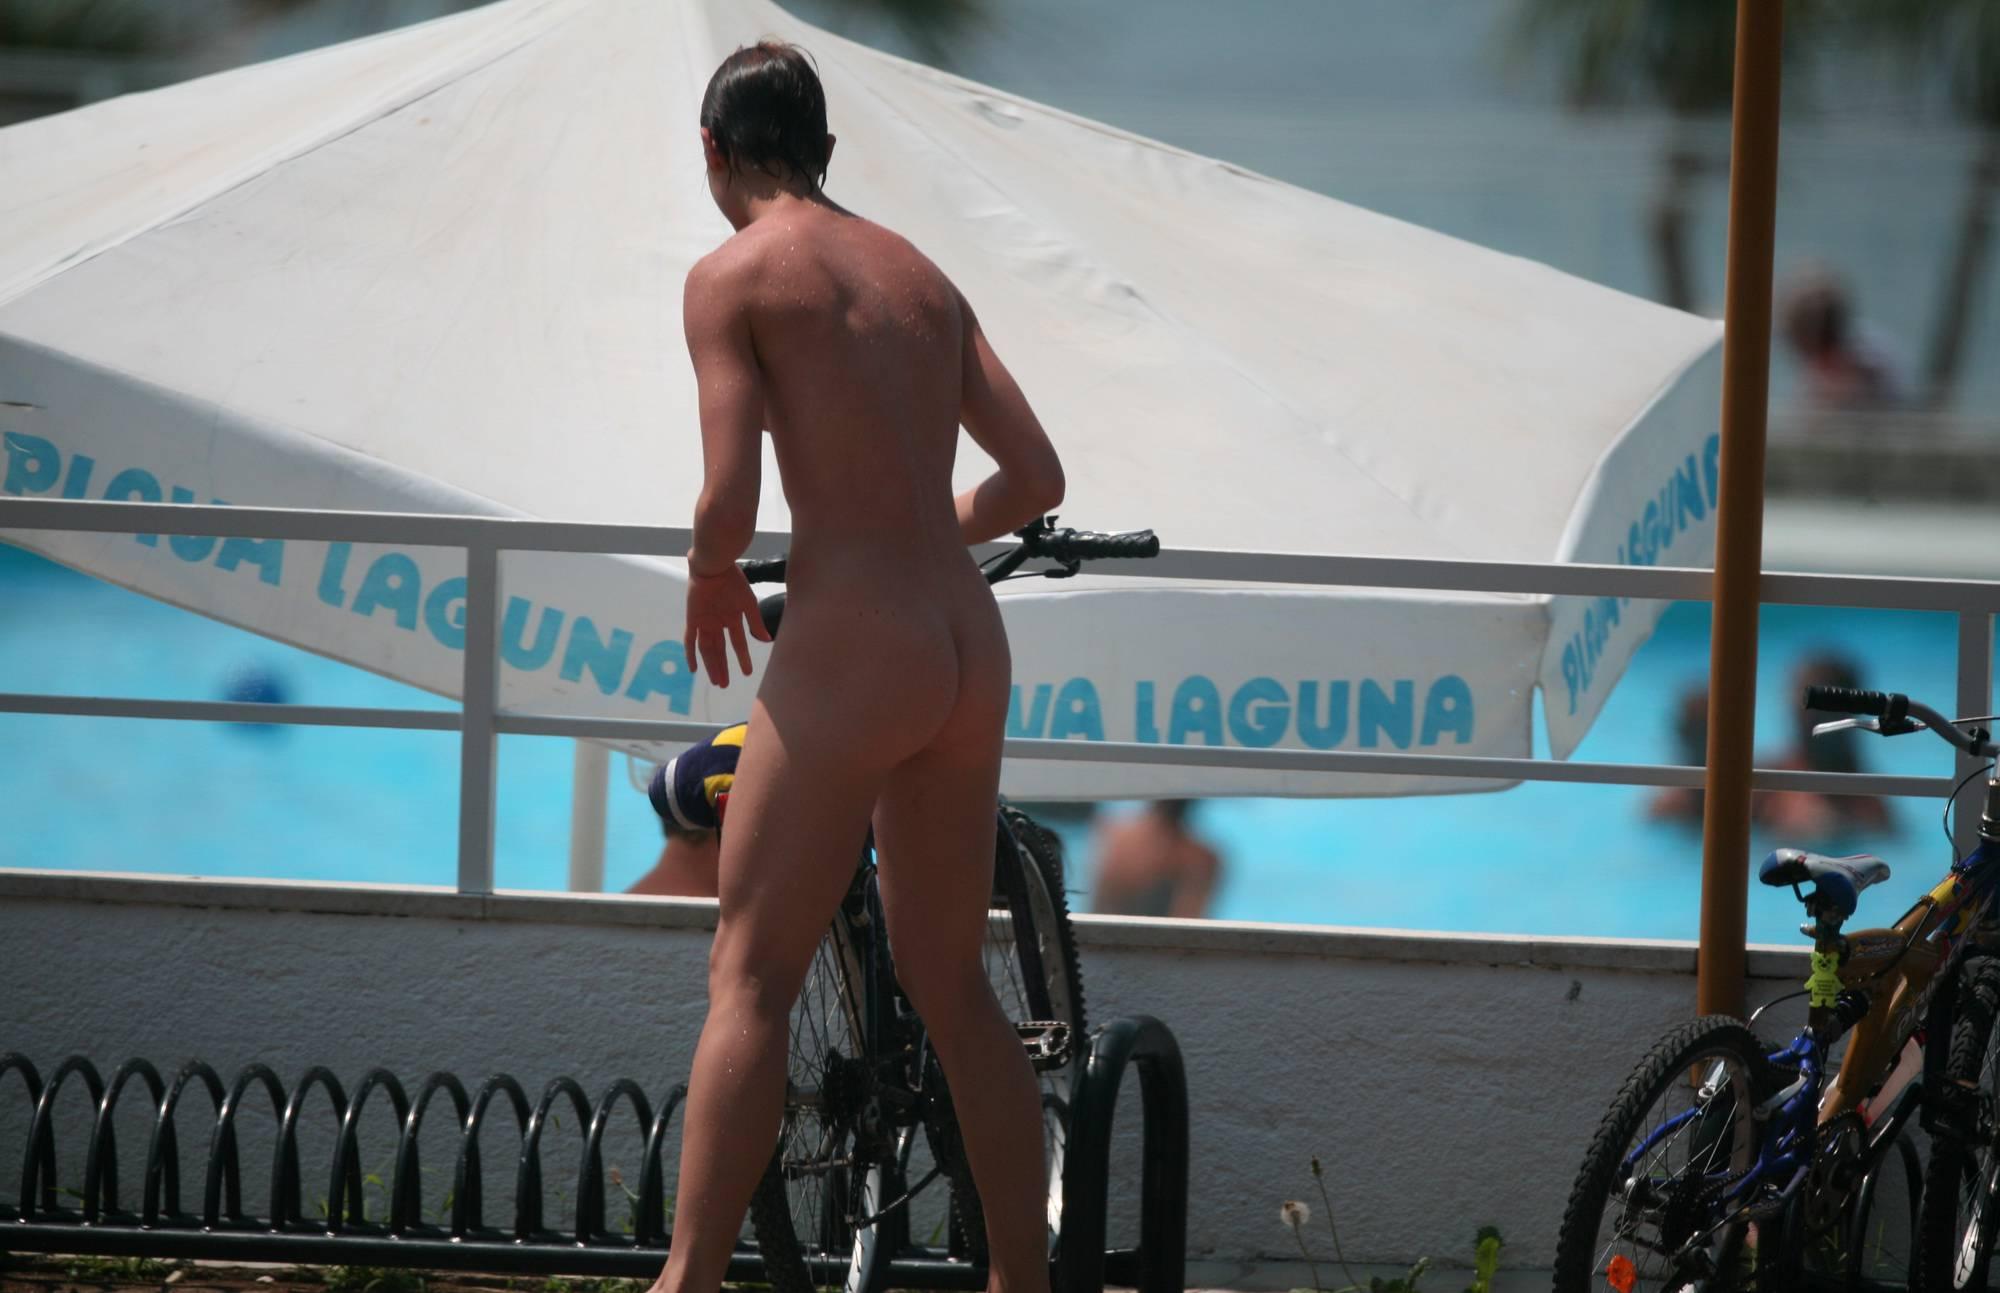 Teenage Nudist Biking Off - 1